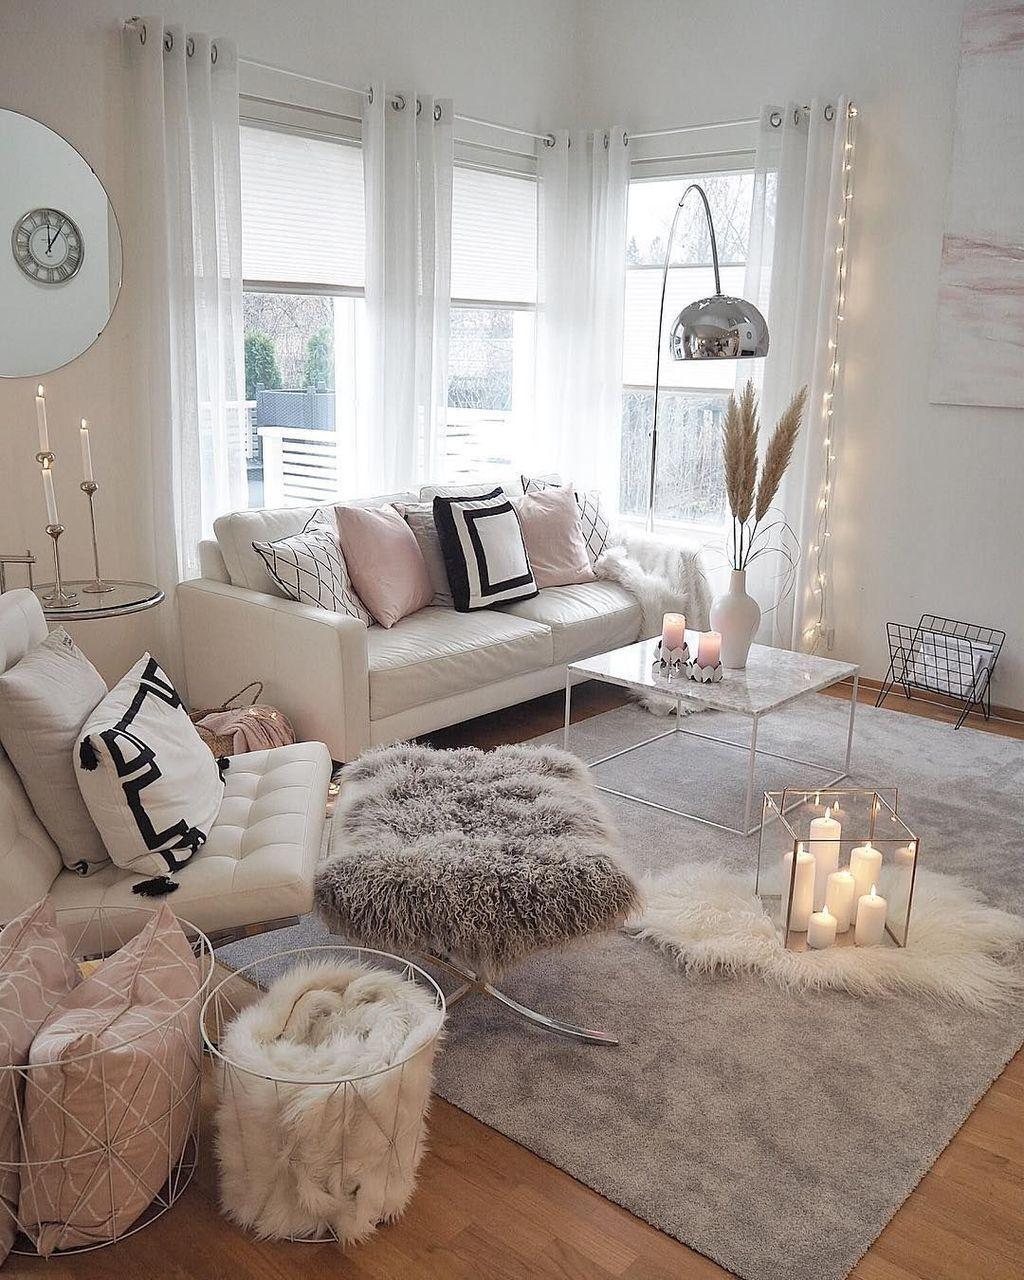 Jogger Waist Shorts Winter Living Room Winter Living Room Decor Living Room Decor Apartment